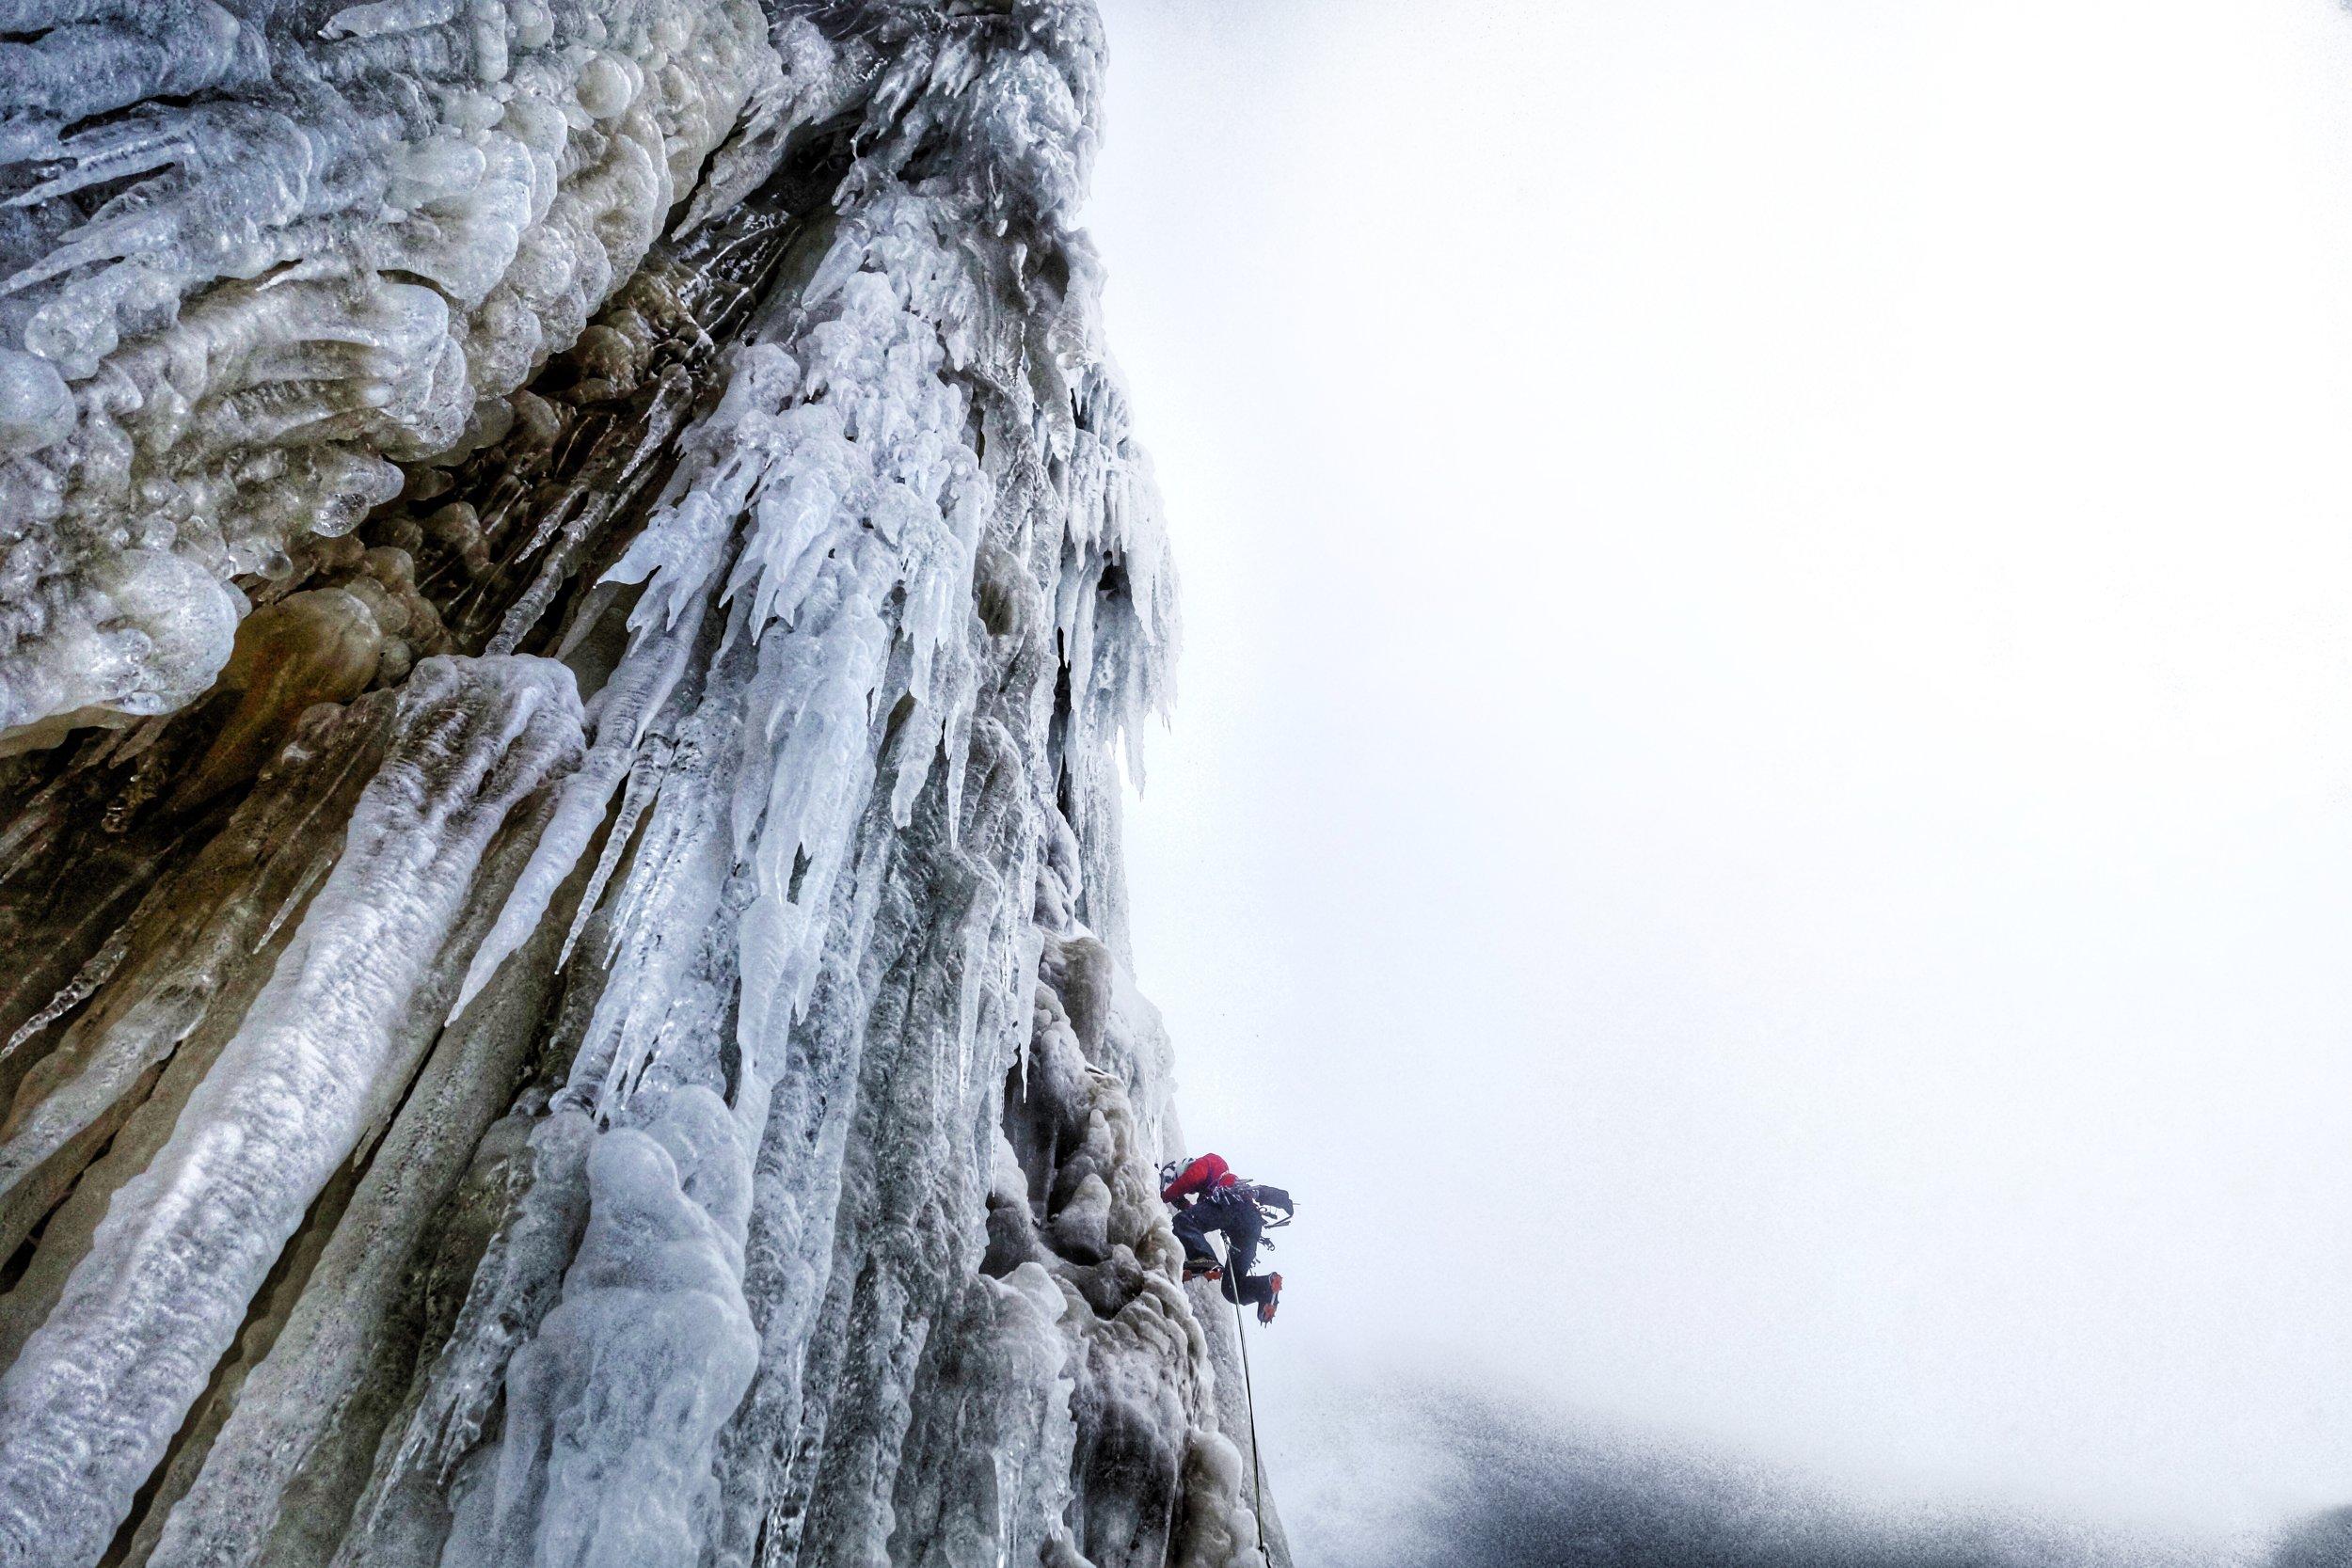 Matthias Scherer on Fjåene Fossen, Eidfjord Norway - picture Tanja Schmitt